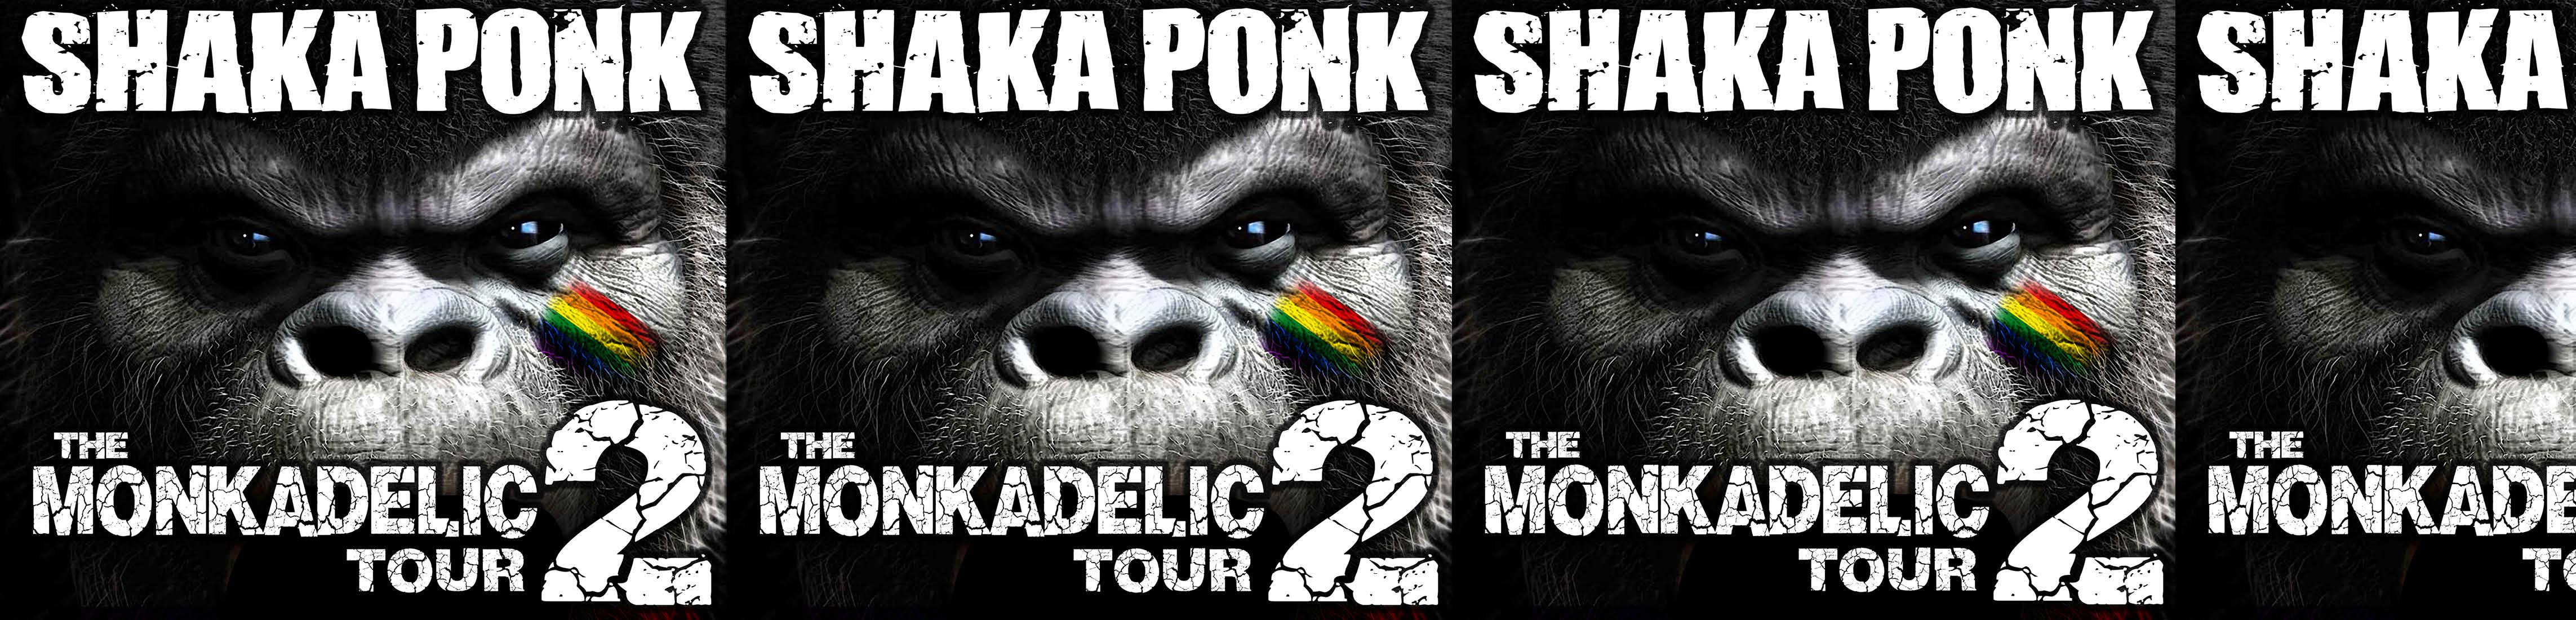 Shaka-Ponk-3